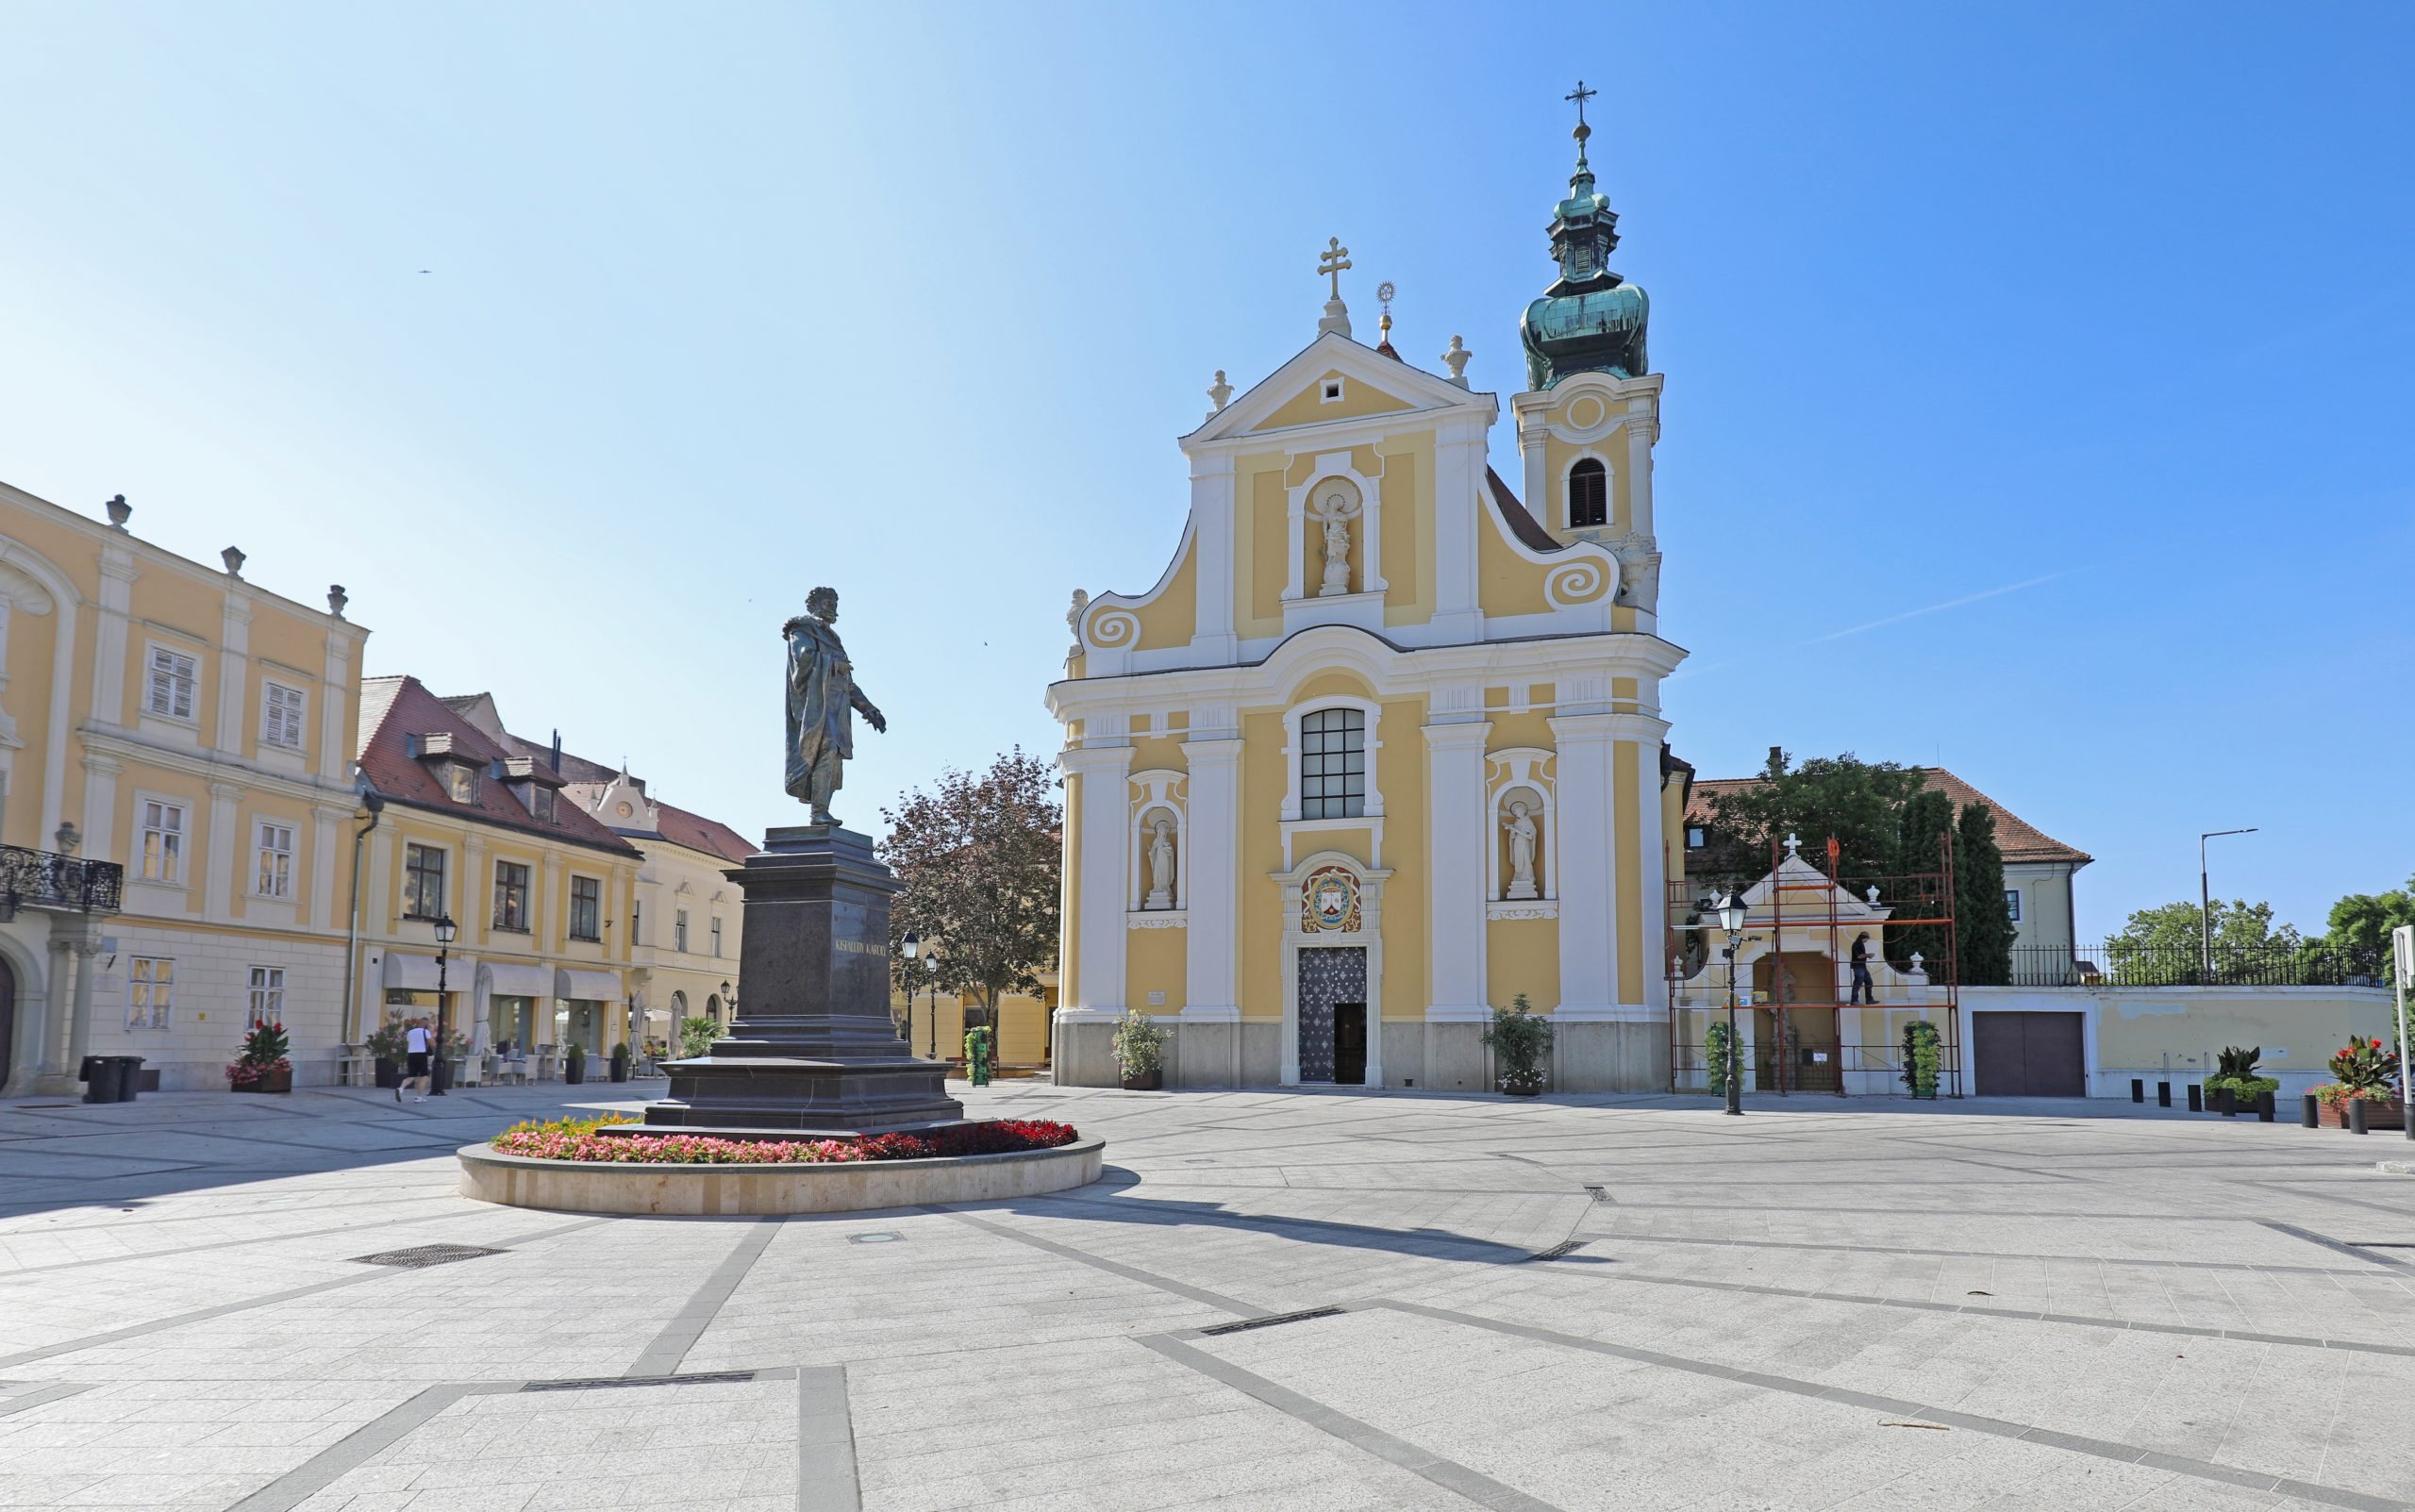 <a href='http://hellogyor.hu/en/sights/becsi-kapu-square/'>Bécsi kapu Square</a>